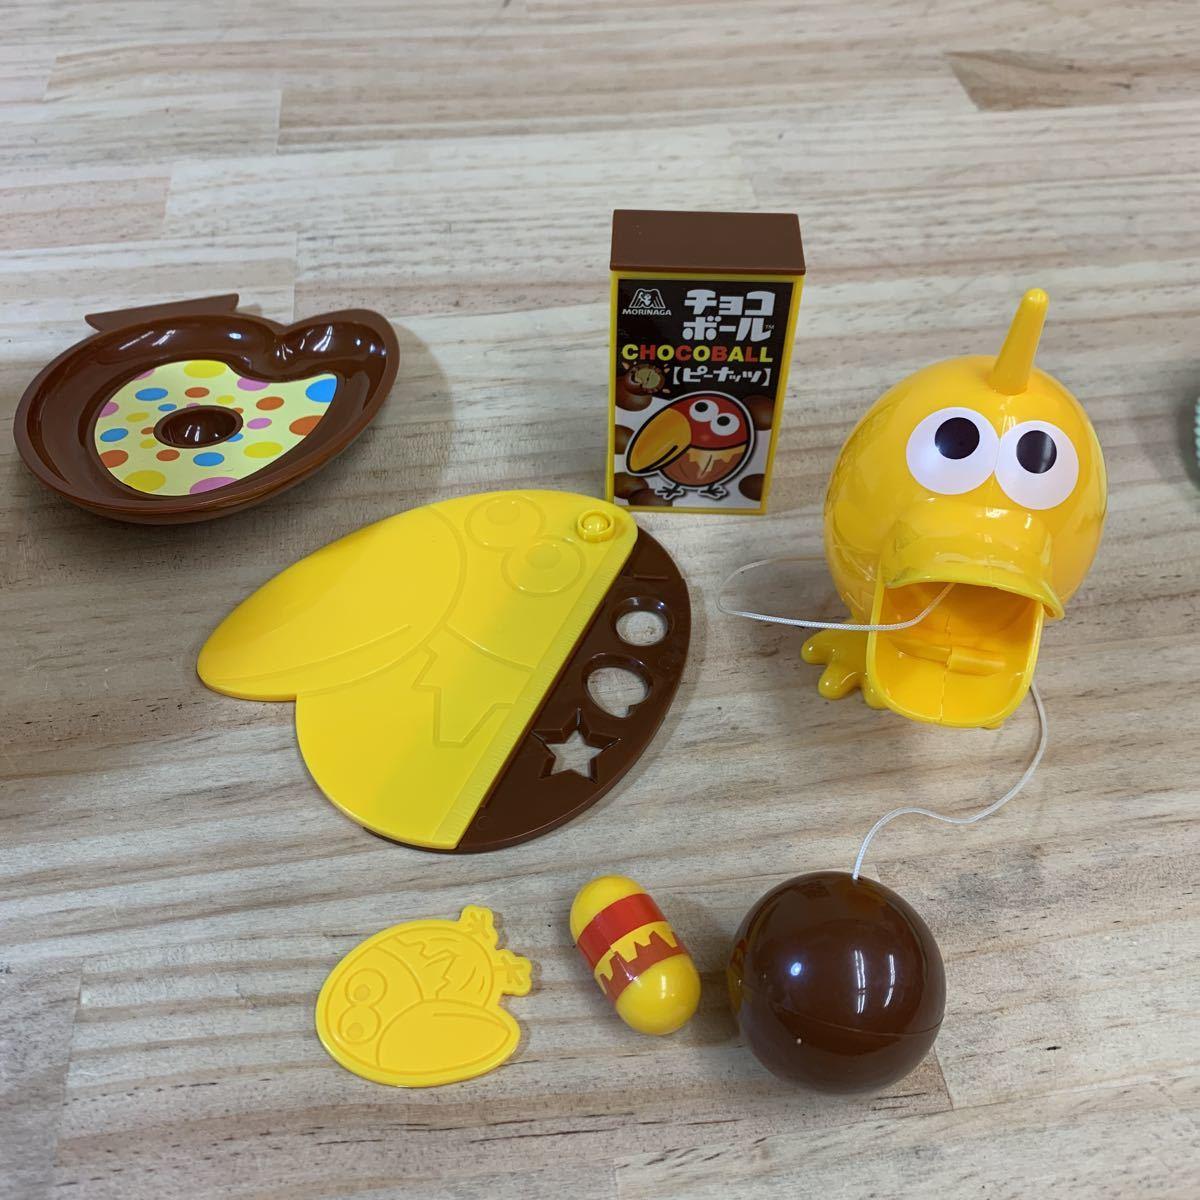 4N8728-5 しゃべる 金のキョロちゃん缶 森永チョコボール おもちゃのカンヅメ_画像6